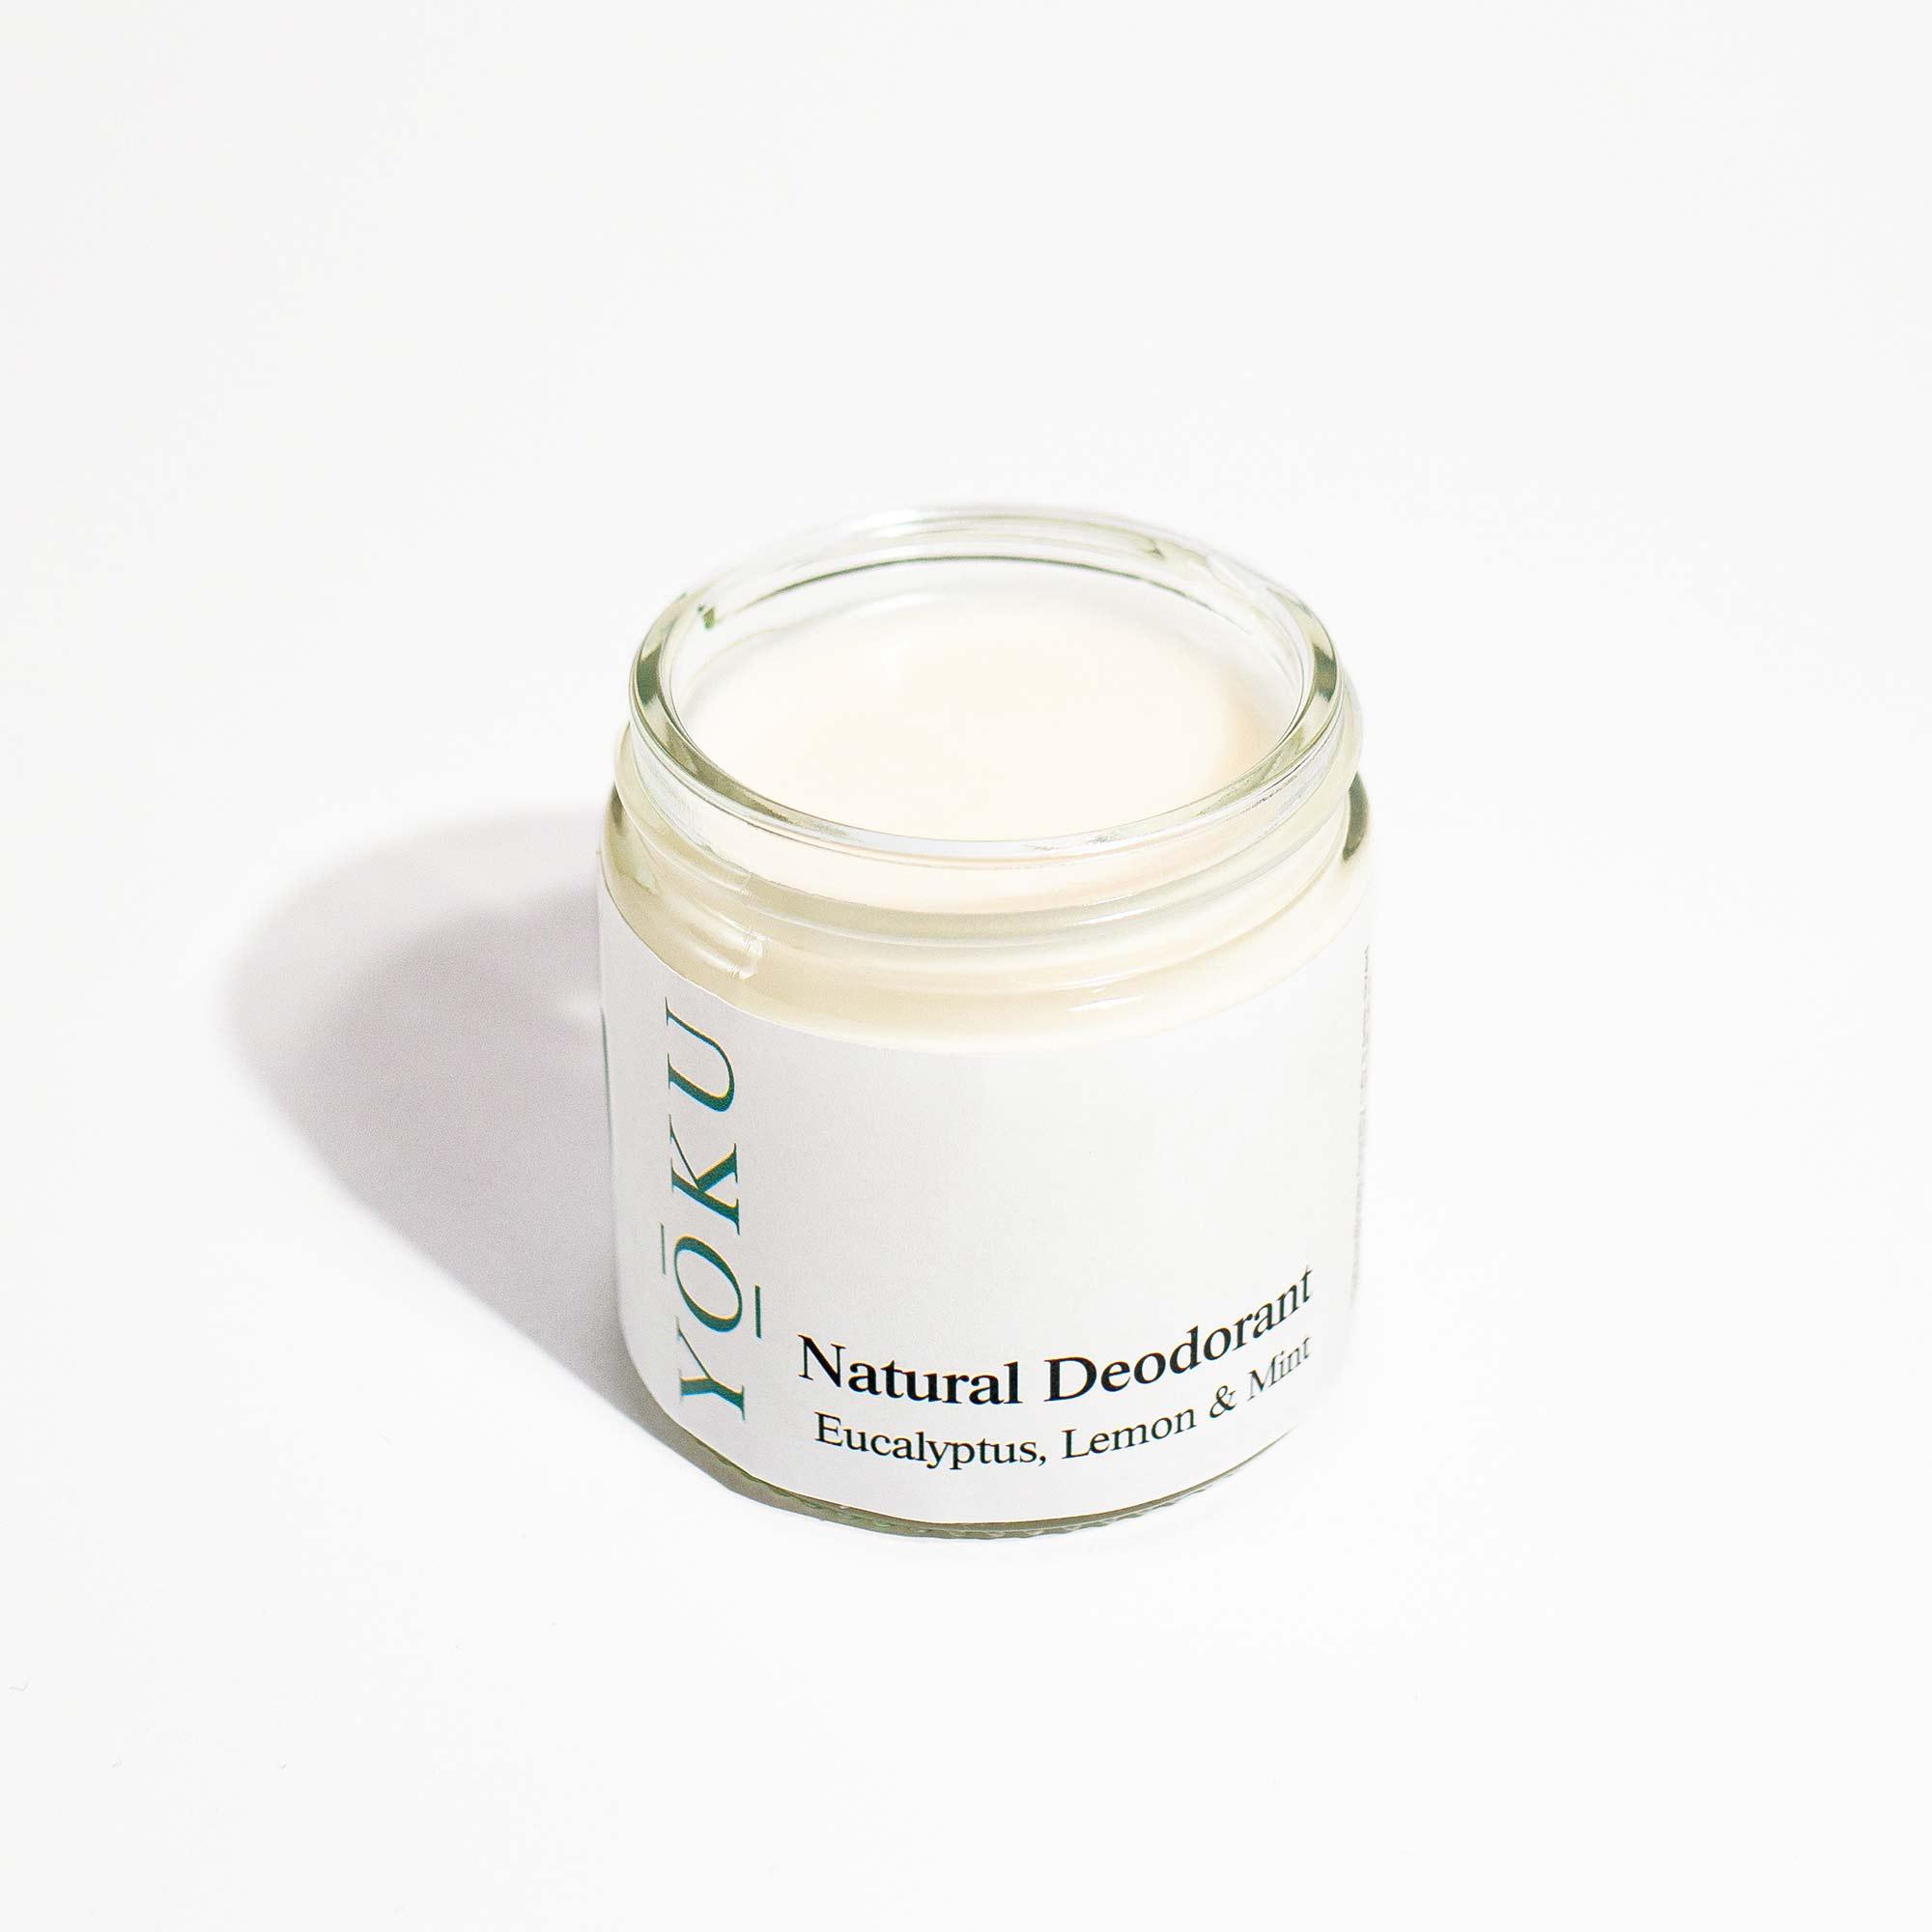 YOKU Natural Deodorants - Eucalyptus, Lemon & Mint 2